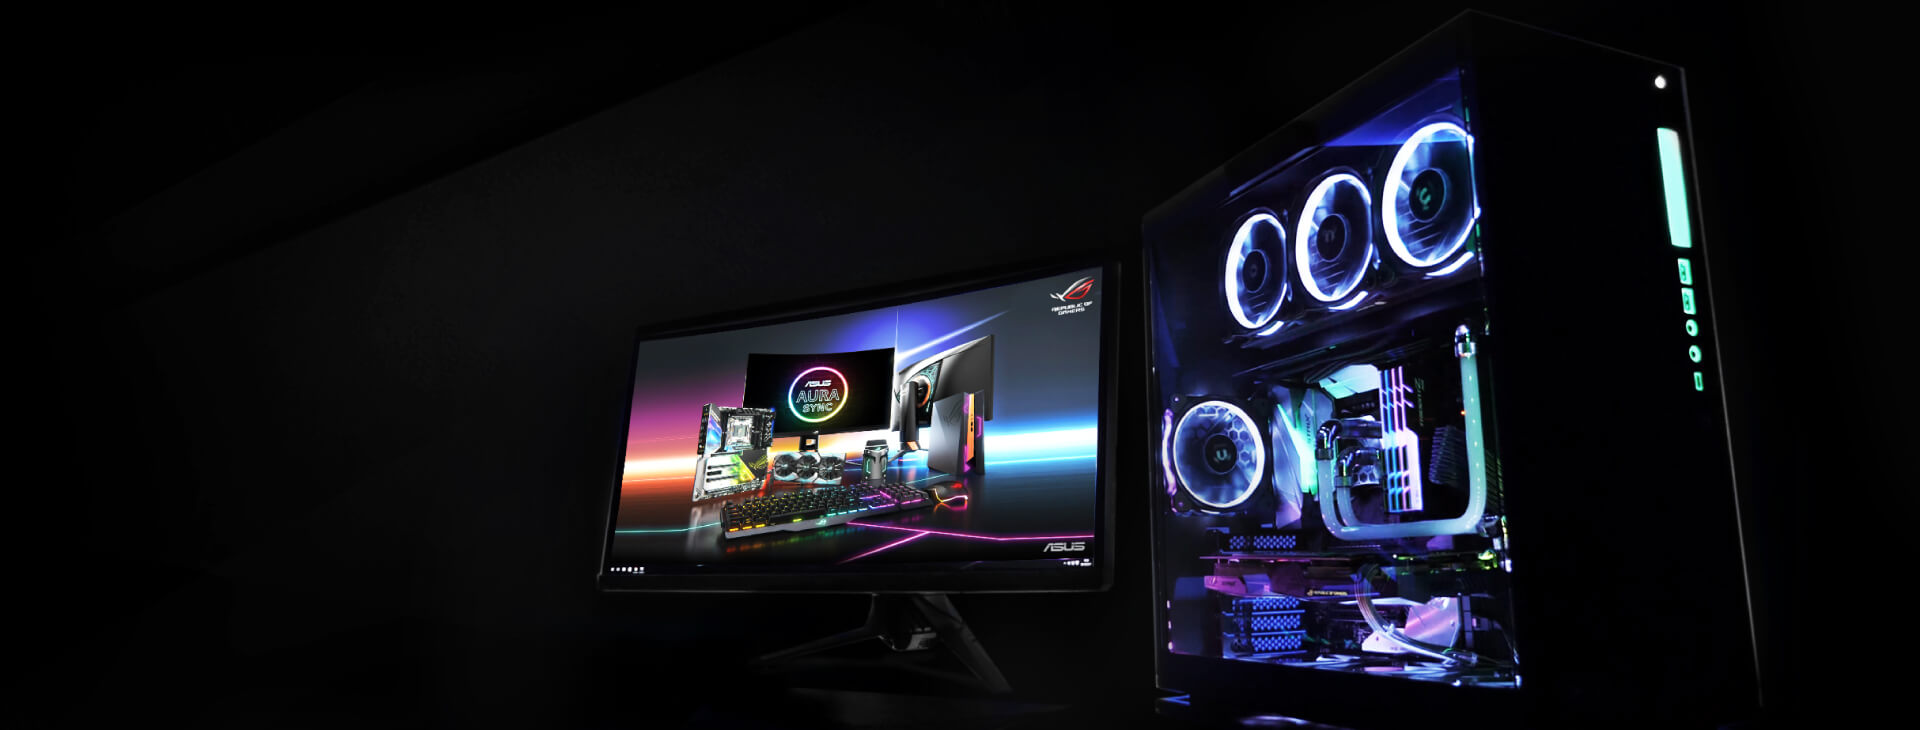 ASUS ROG Strix H370-F Gaming Carte M/ère Intel ATX Socket LGA 1151